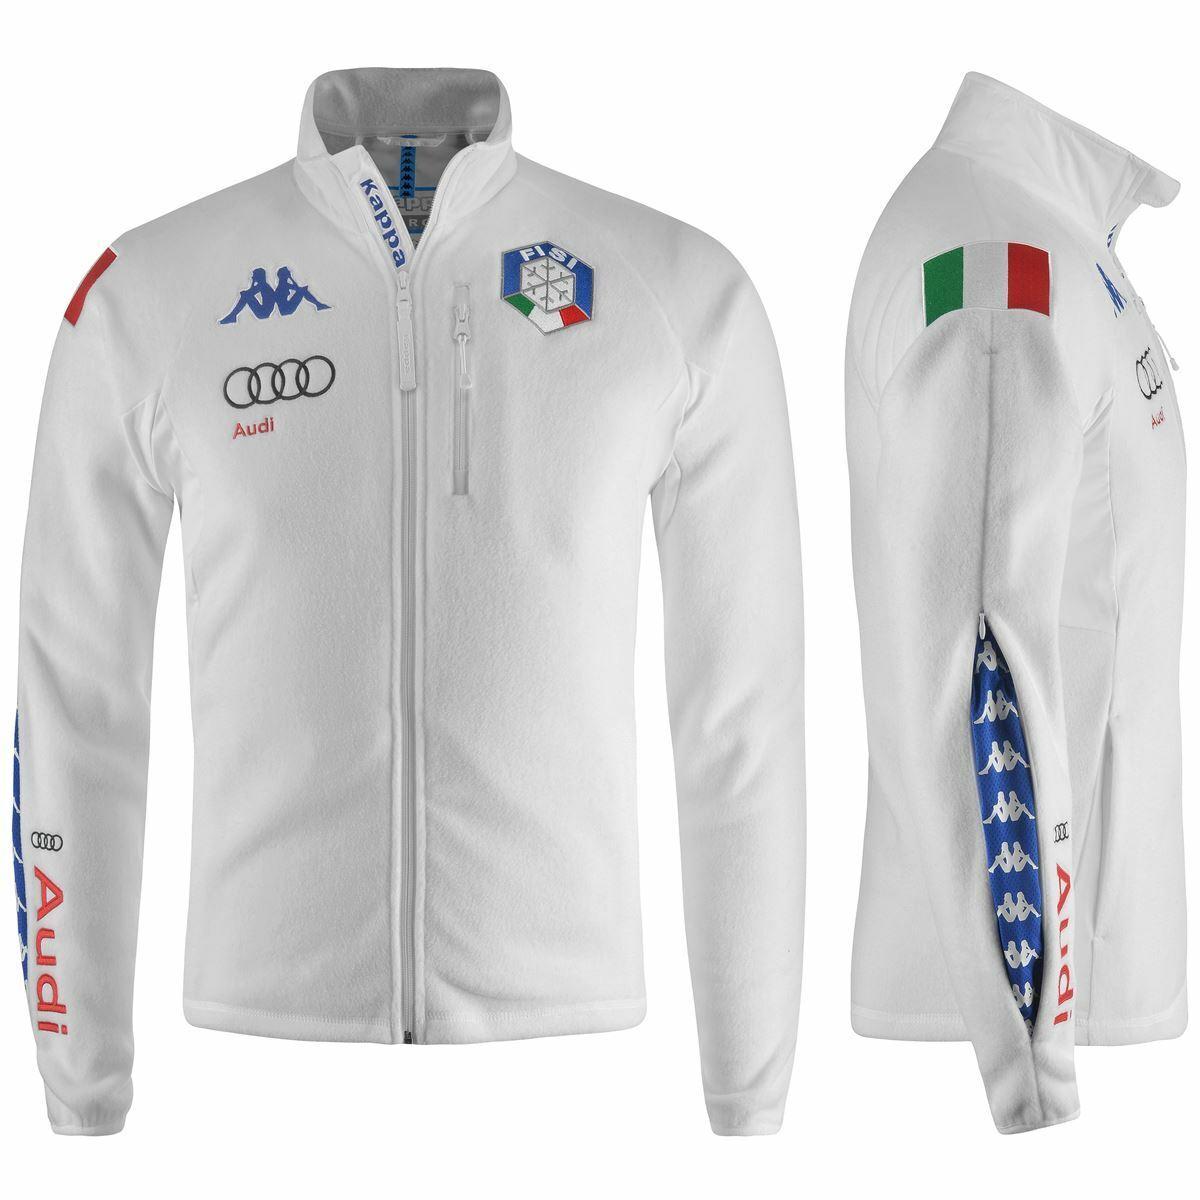 Fisi 2020 Kappa Italia Audi Ski Team Polar 6CENTO 687 Cuello Viento 908